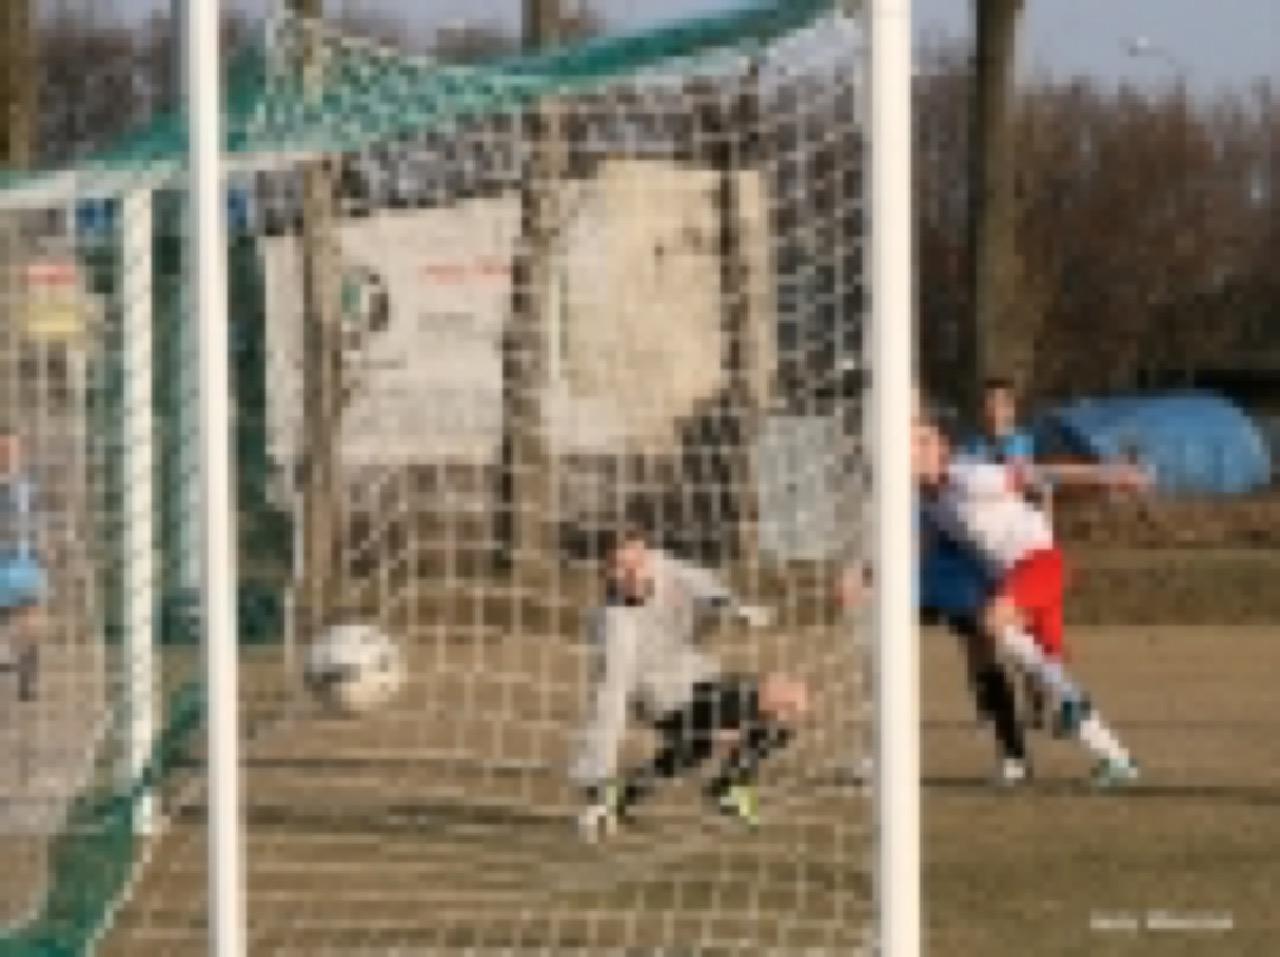 2012.03.24, SKS Gwarek Zabrze.